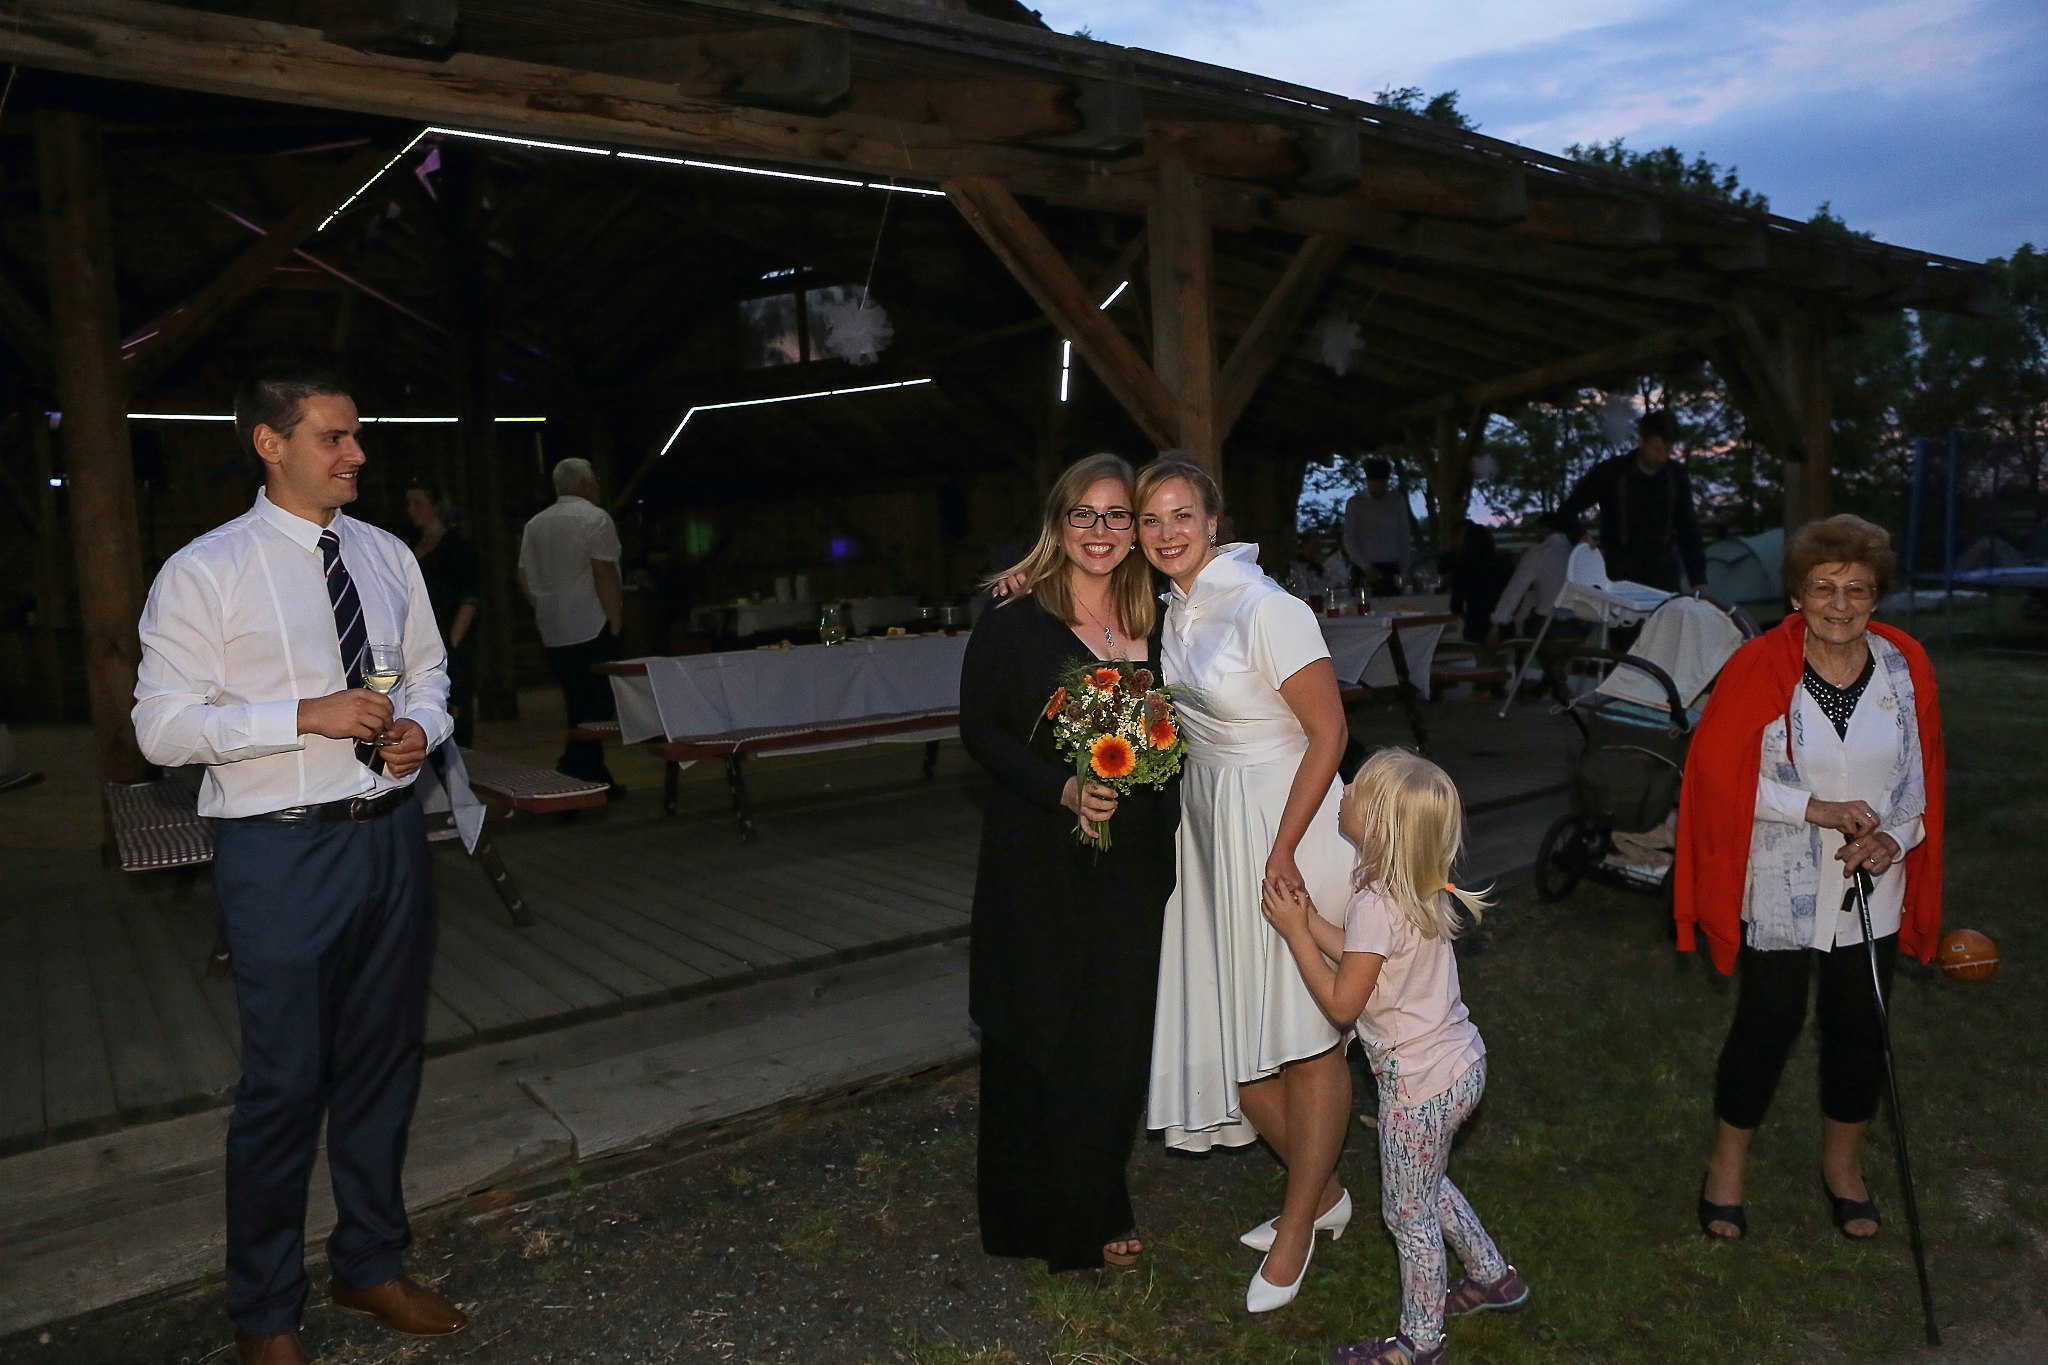 svatba, ranč dalu, venkovská, obřad, hostina,